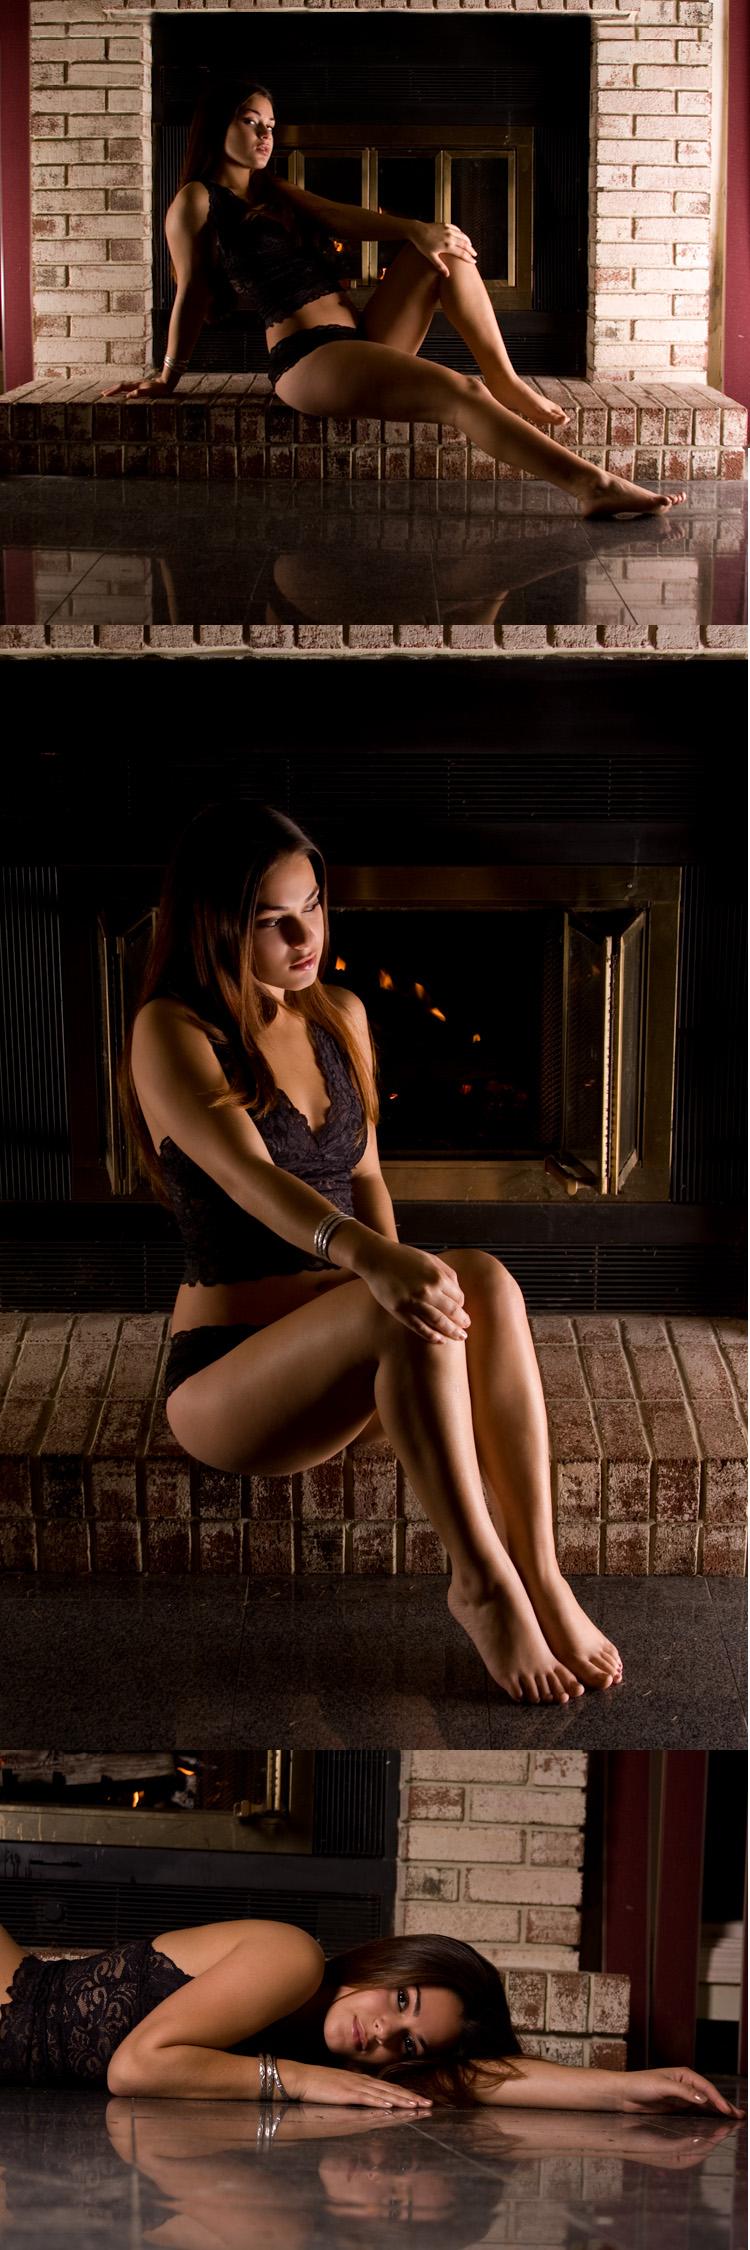 Female model photo shoot of AmandaLiz by removed member